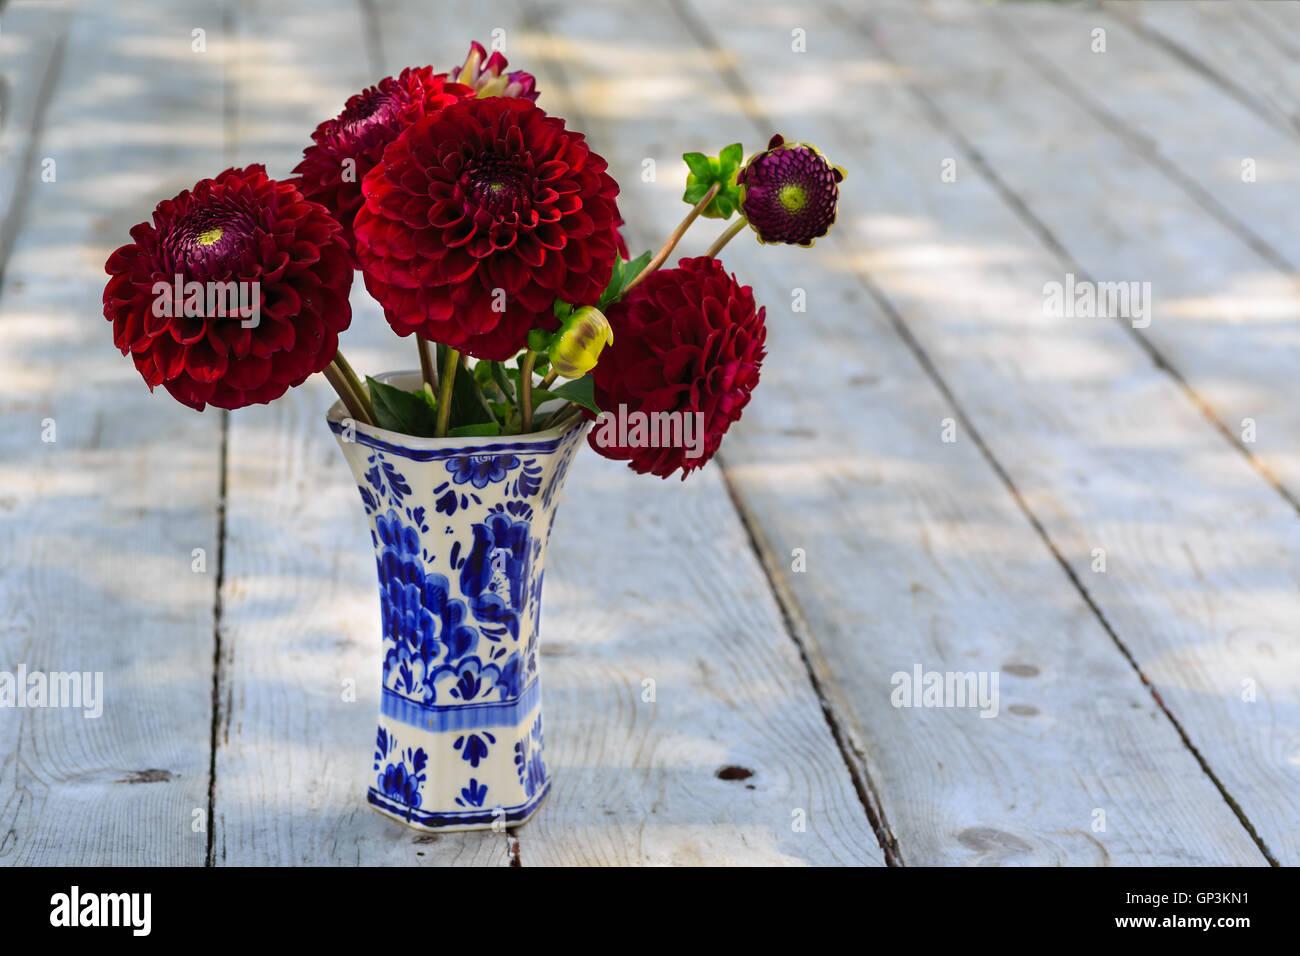 Home garden burgundy dahlias in a delft pottery vase under dappled shade. - Stock Image